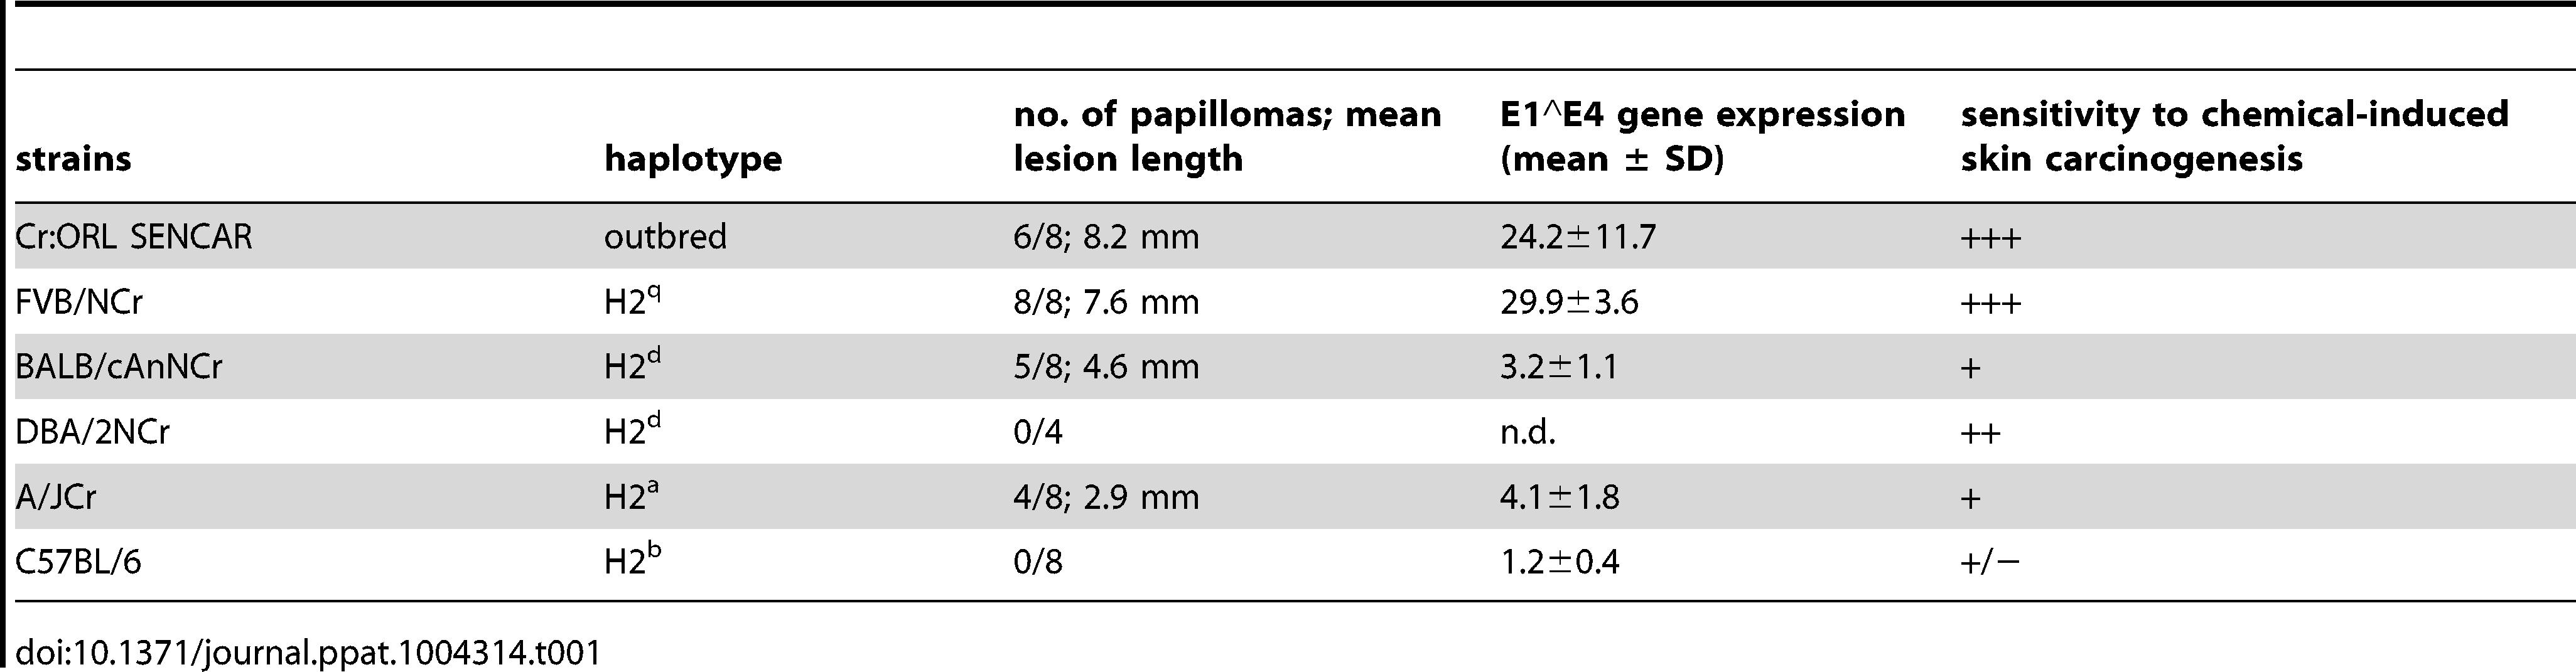 Summary of papilloma development under cyclosporin A treatment in different murine strains.